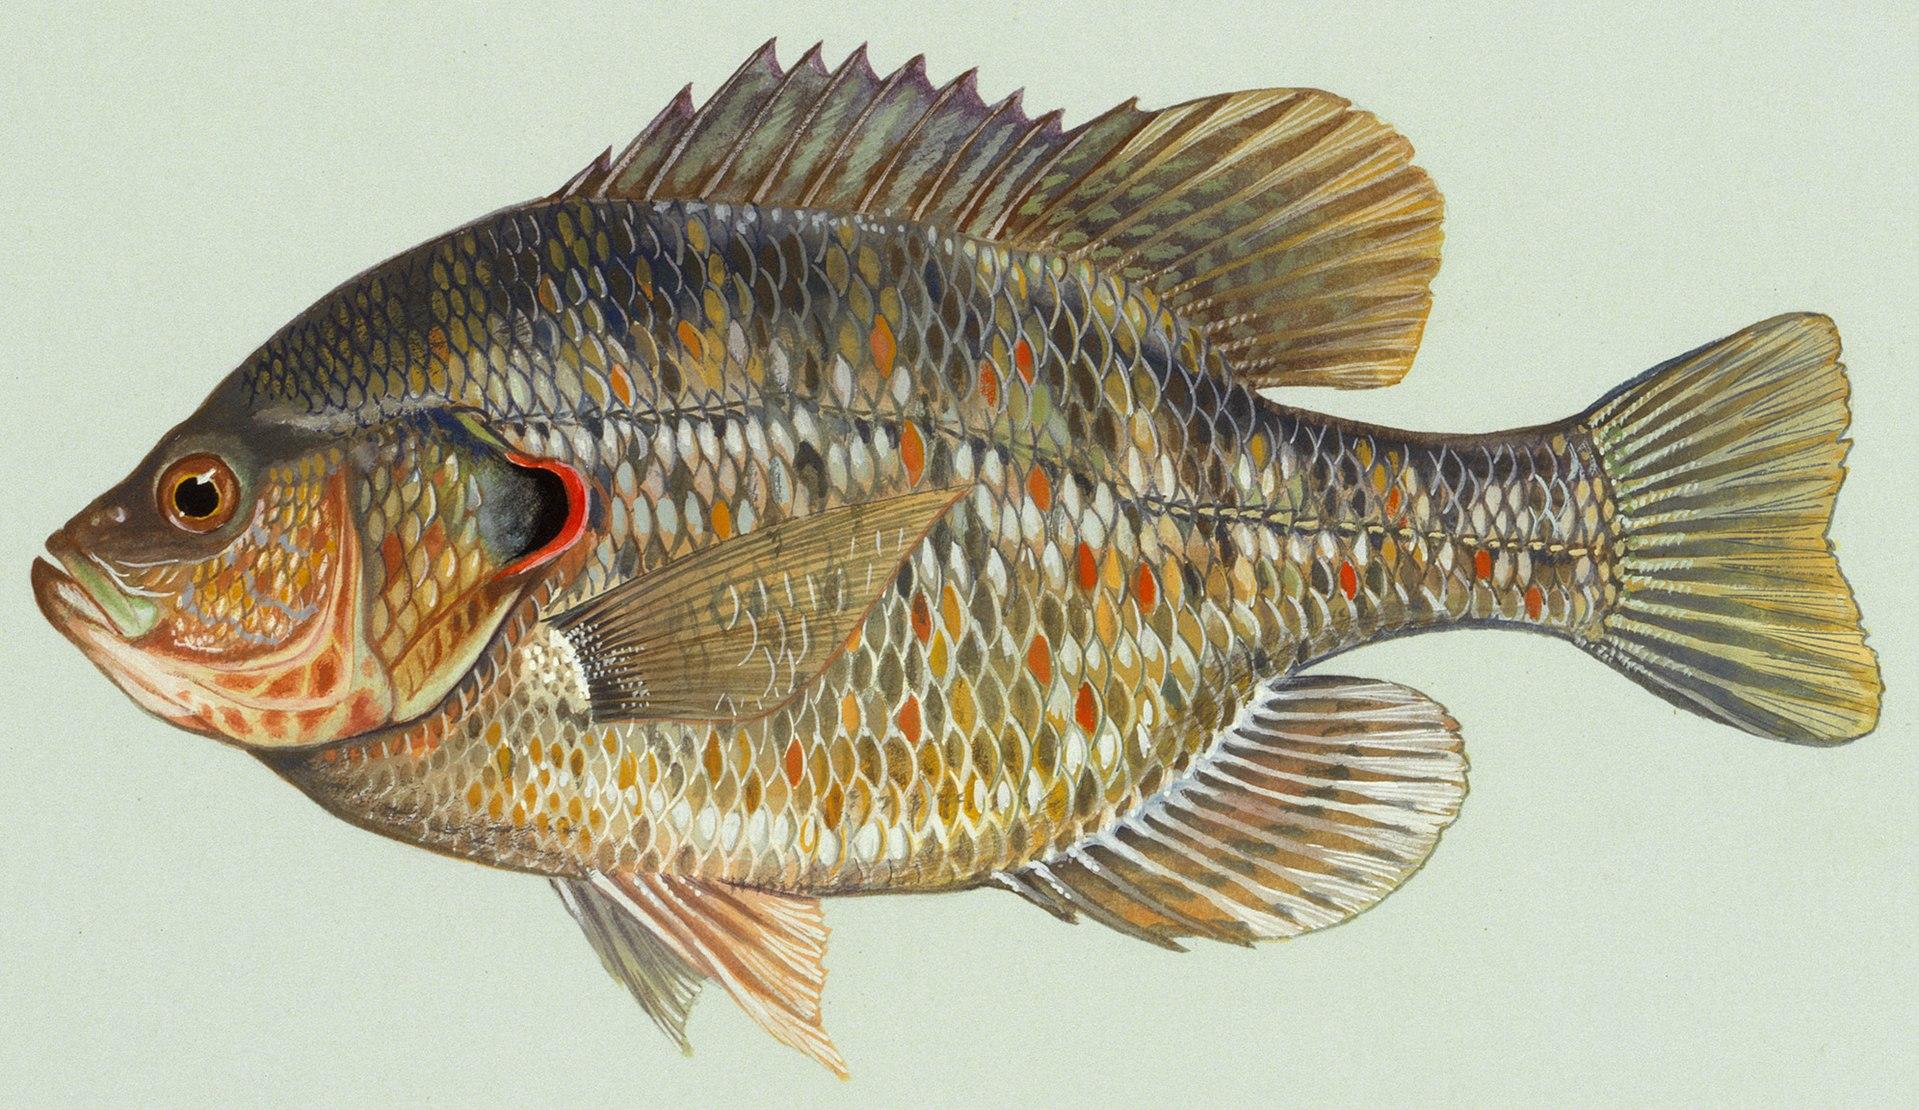 Redear sunfish wikipedia for Blue gill fishing